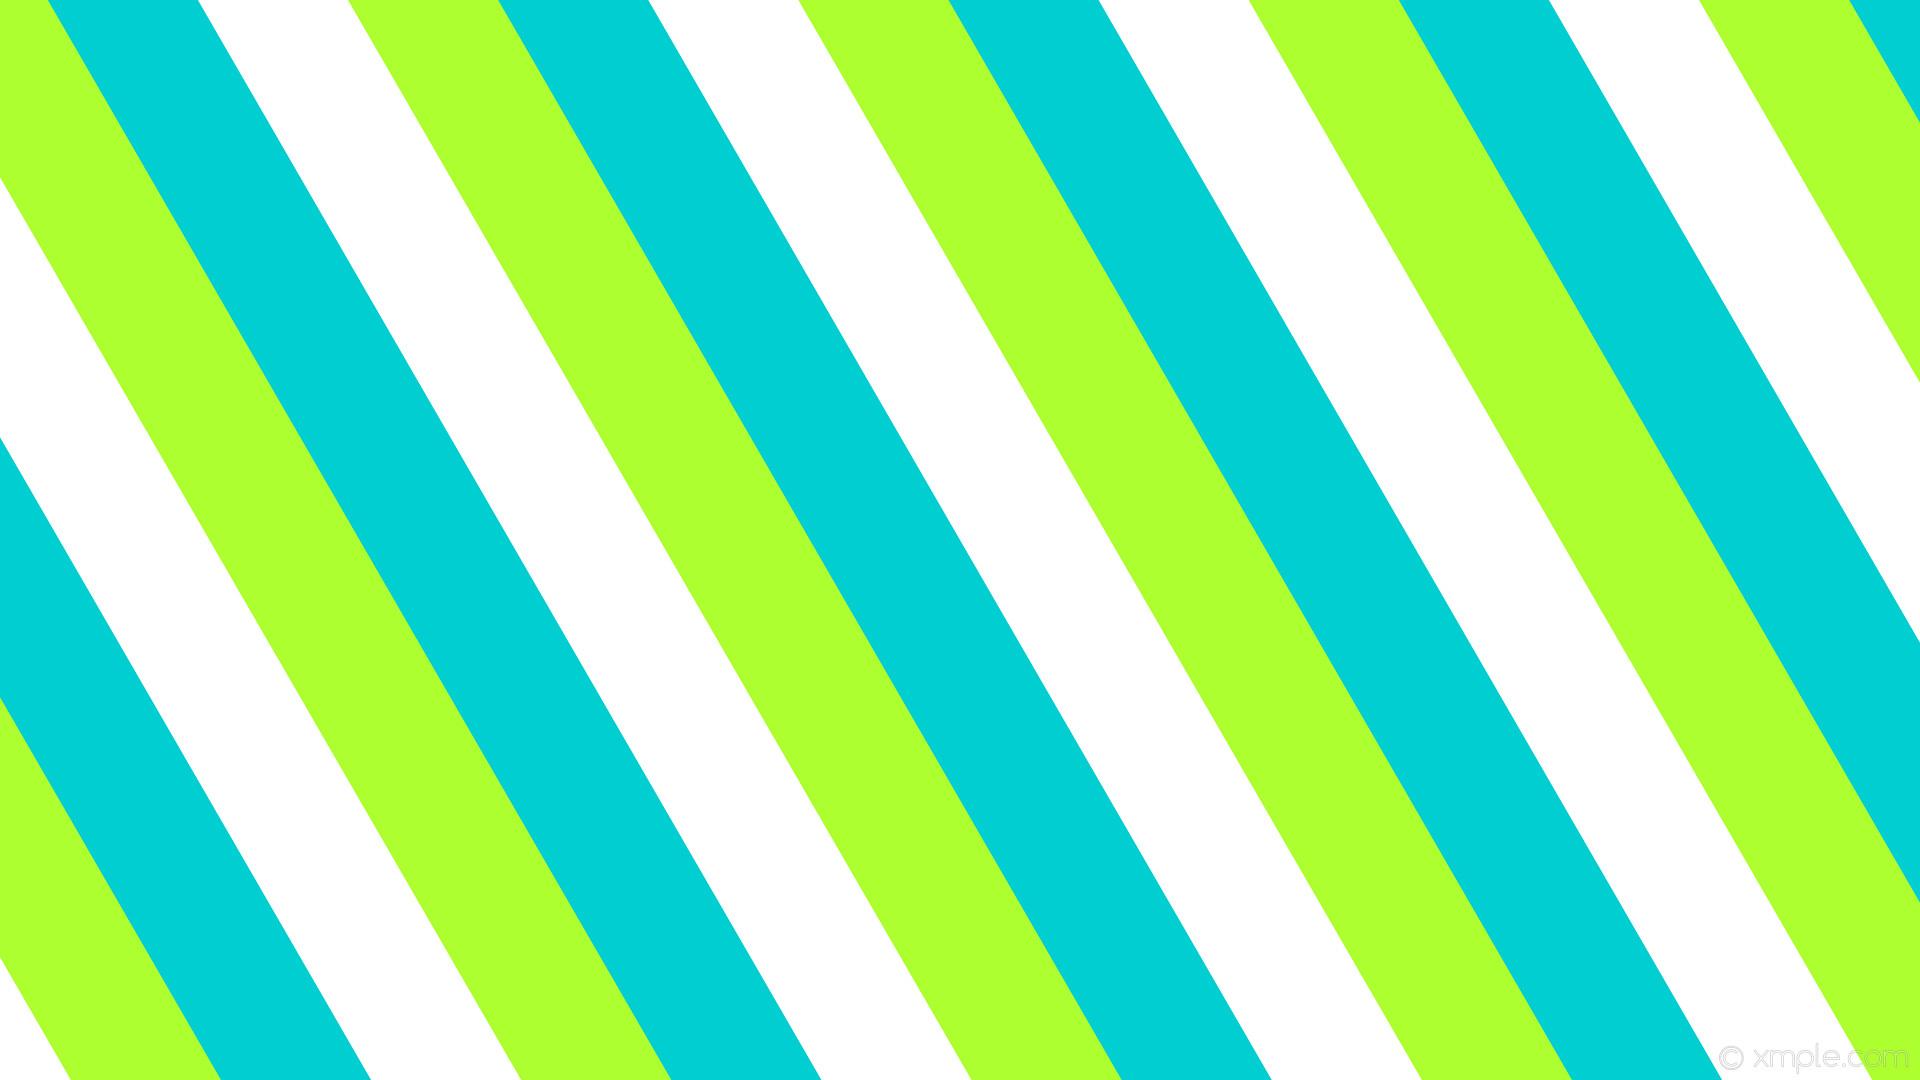 wallpaper white streaks blue green lines stripes green yellow dark  turquoise #ffffff #adff2f #